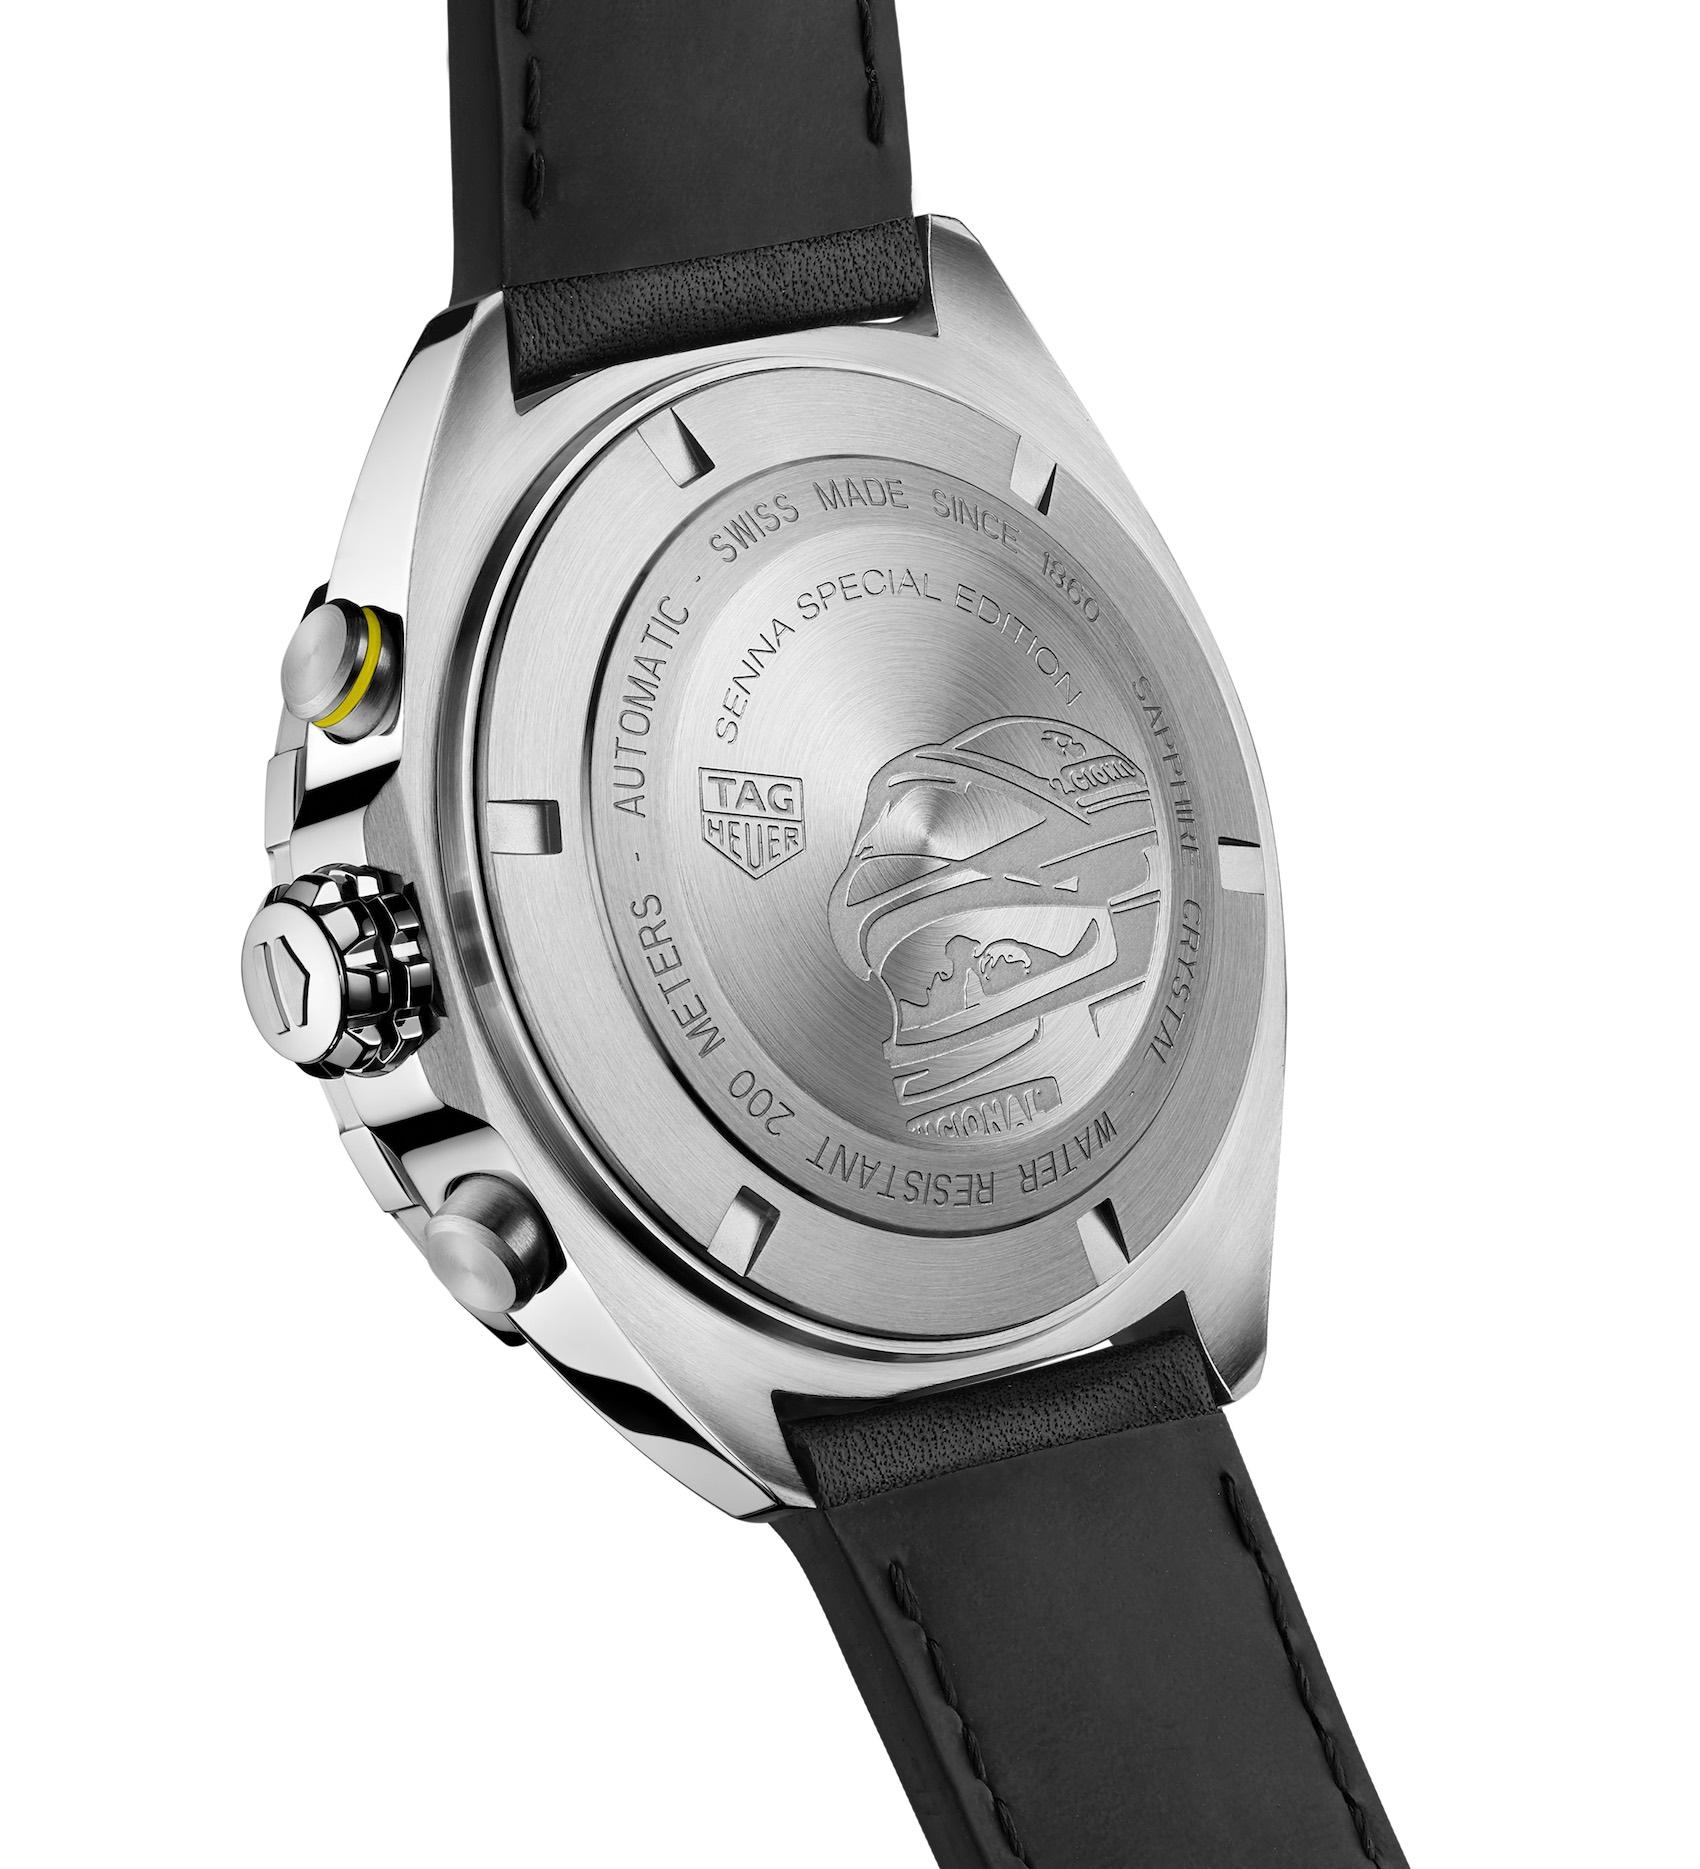 TAG Heuer Formula 1 Senna Special Edition 2020 automatic chronograph 3